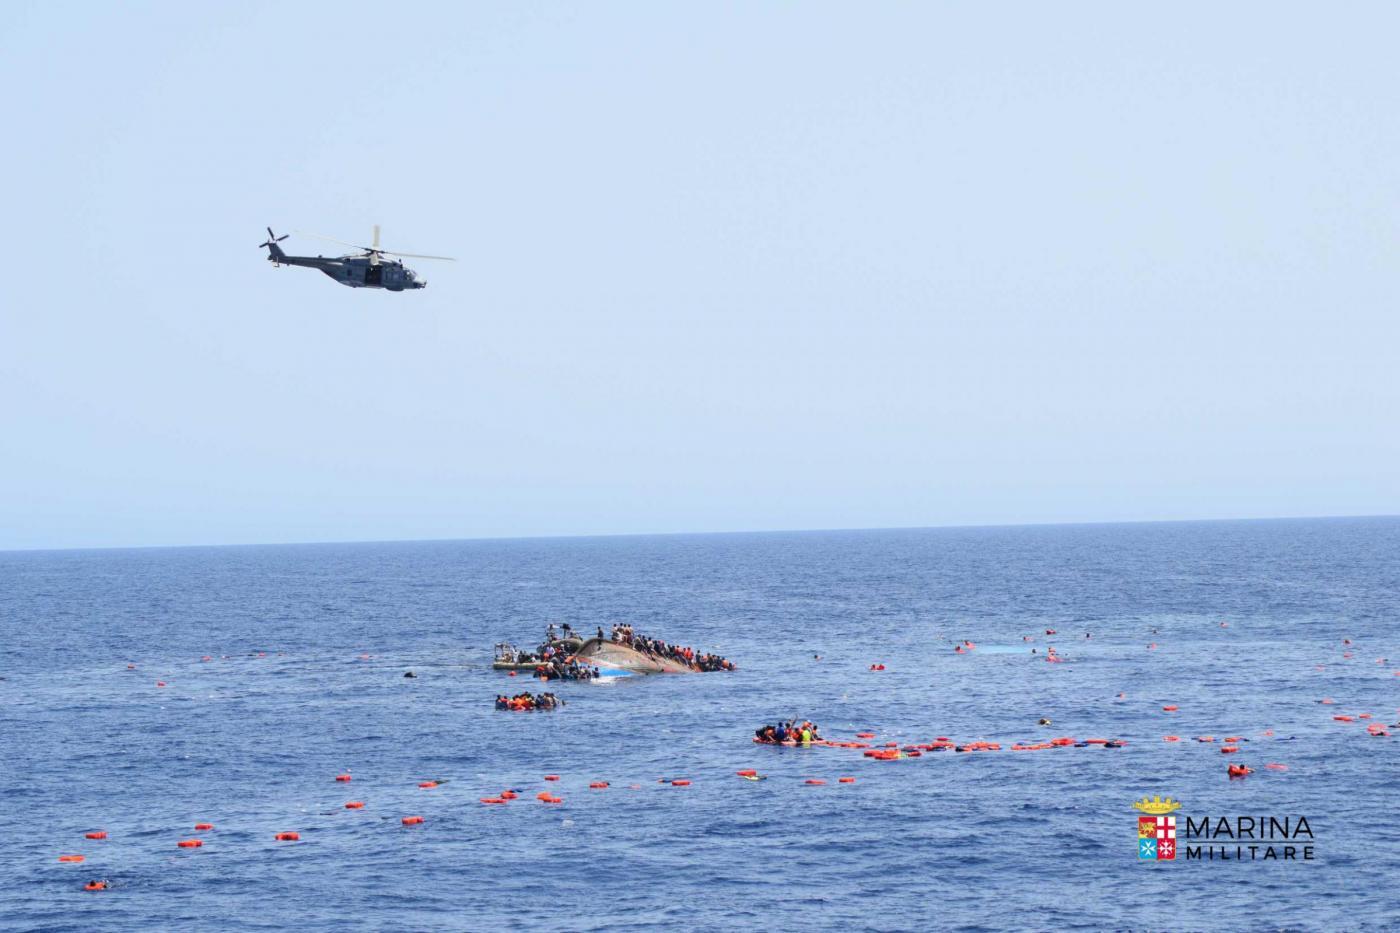 Migranti, tragedia infinita: 400 i dispersi nell'ultimo naufragio